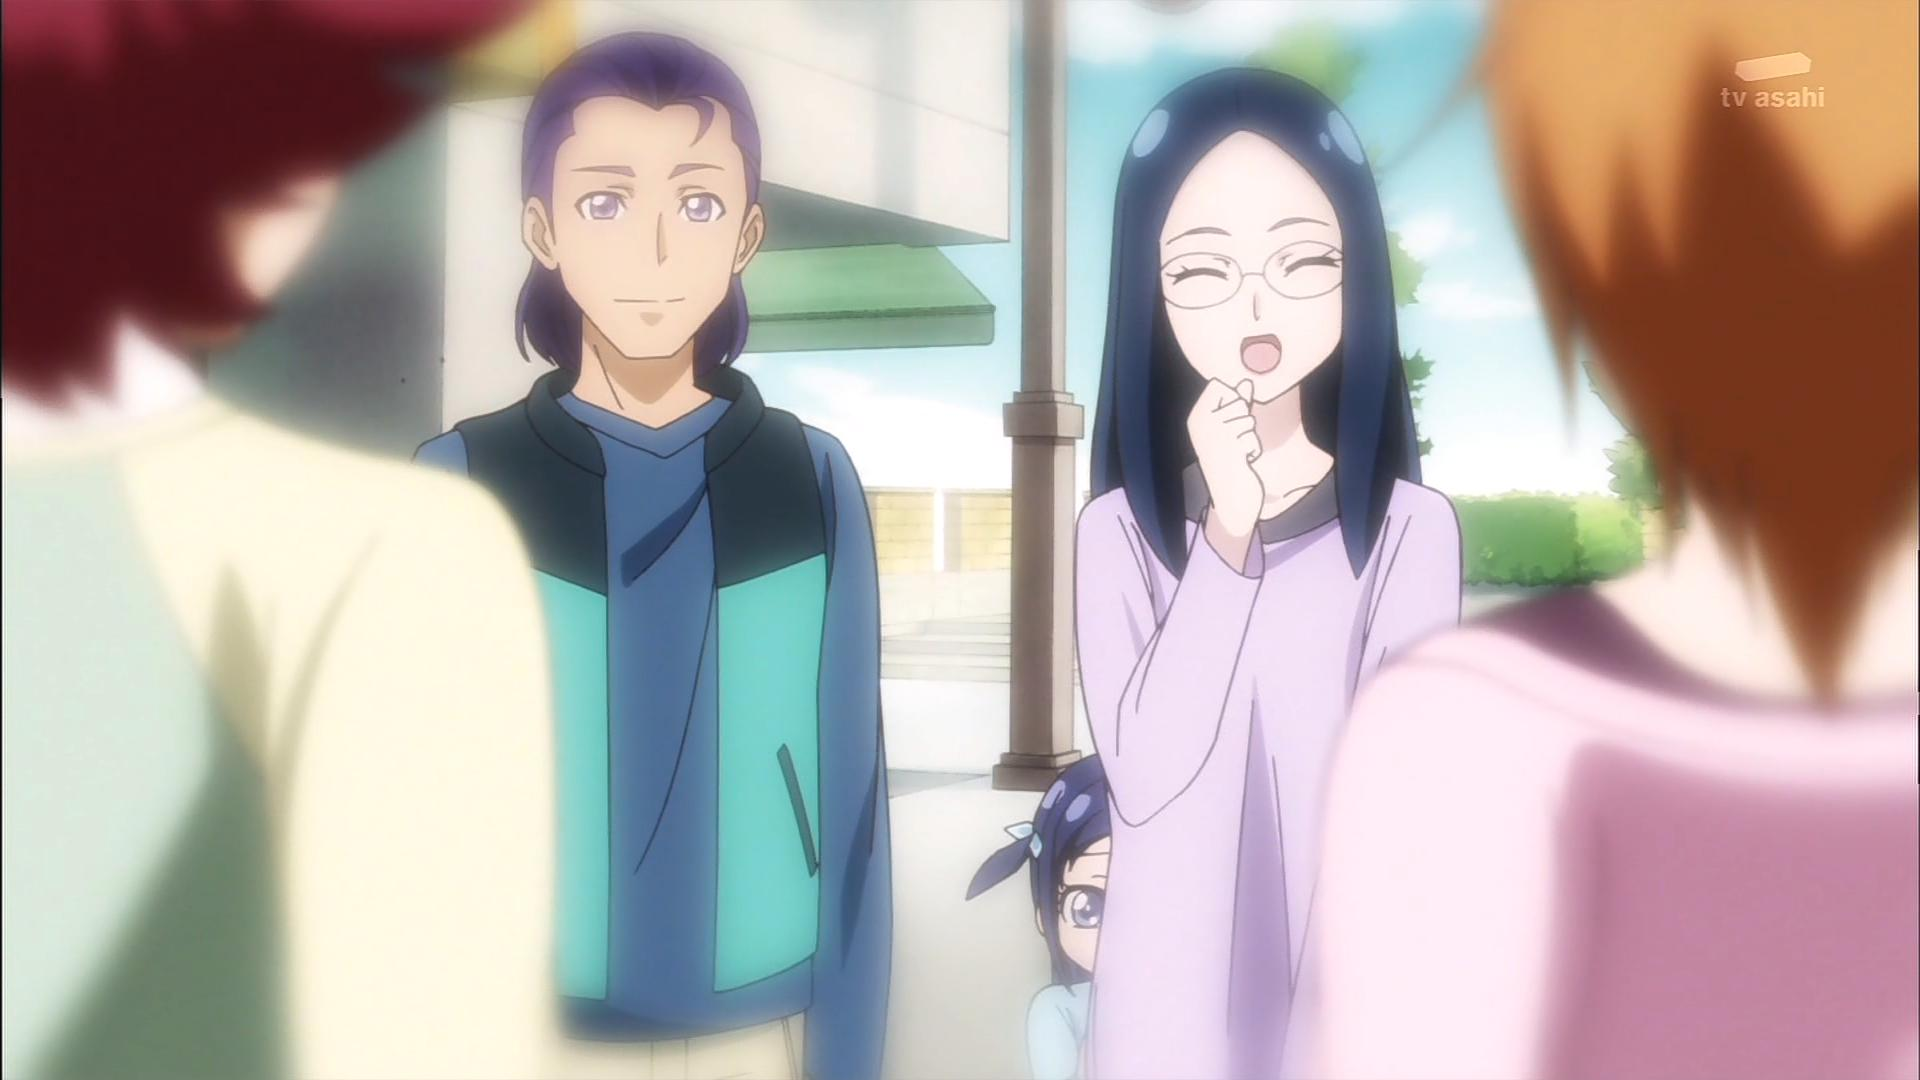 dkp03-hishikawafamily02.jpg